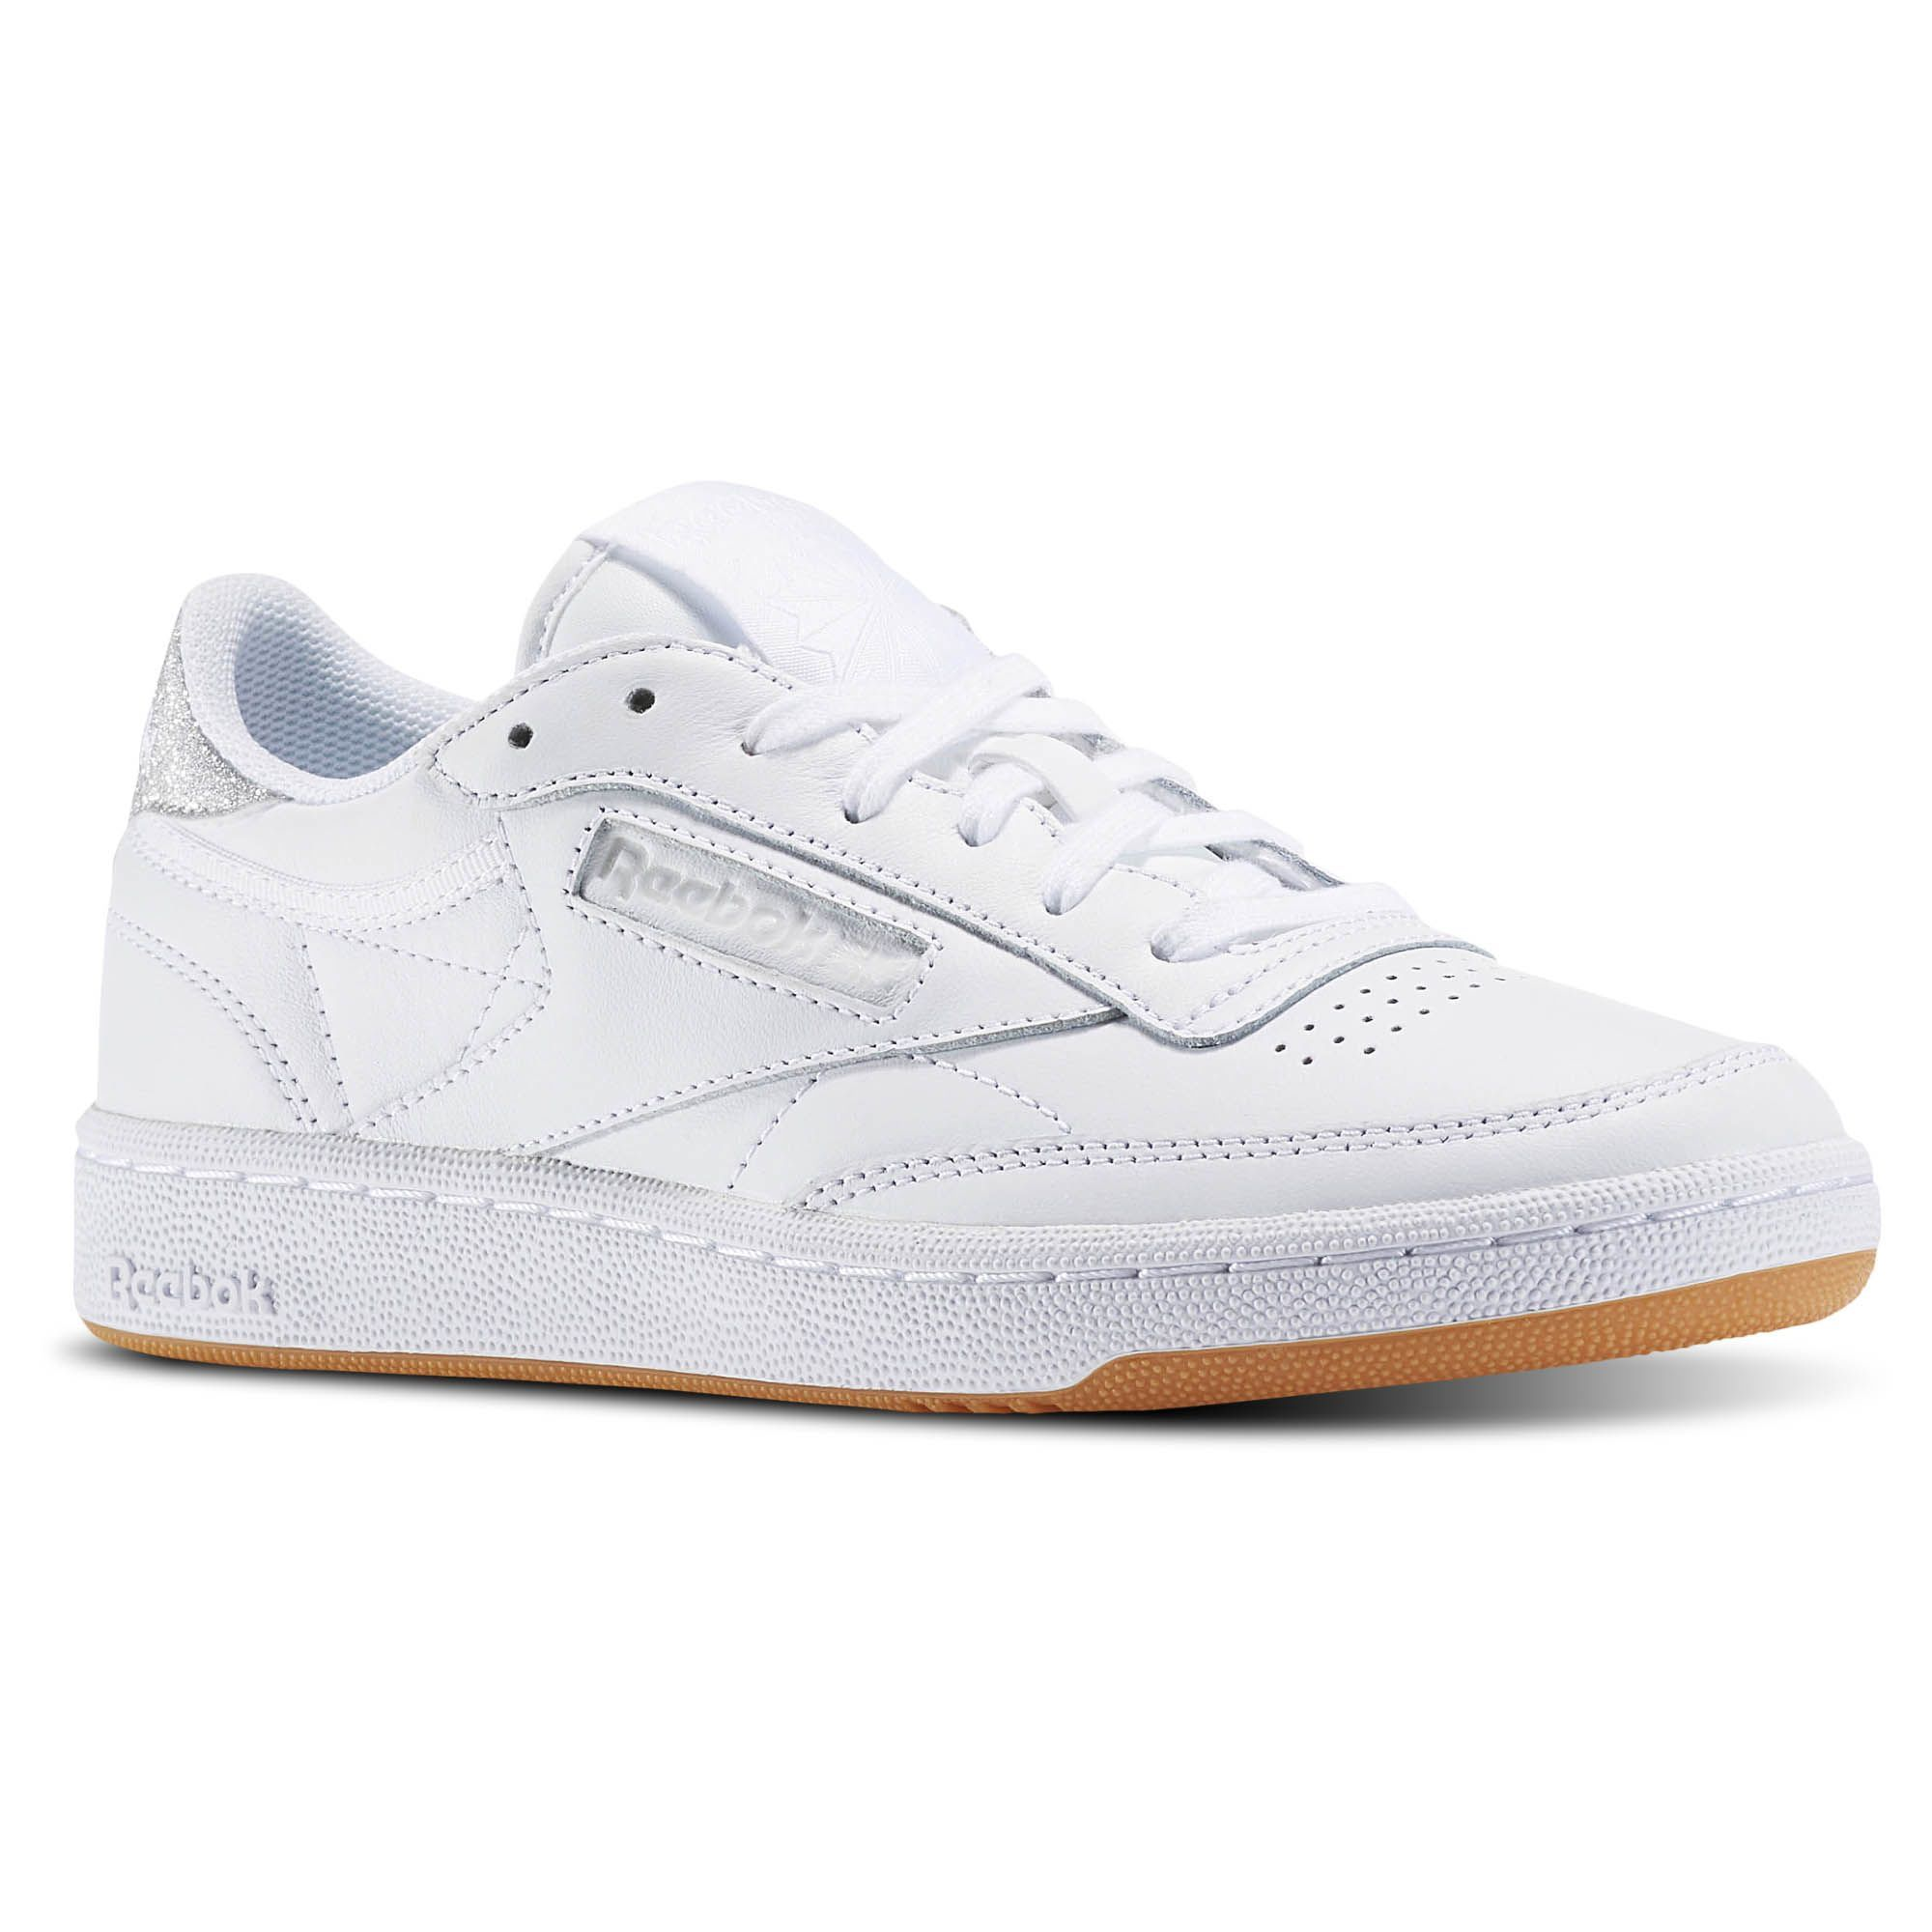 Reebok Club C 85 Diamond | Shoes | Reebok, Popular